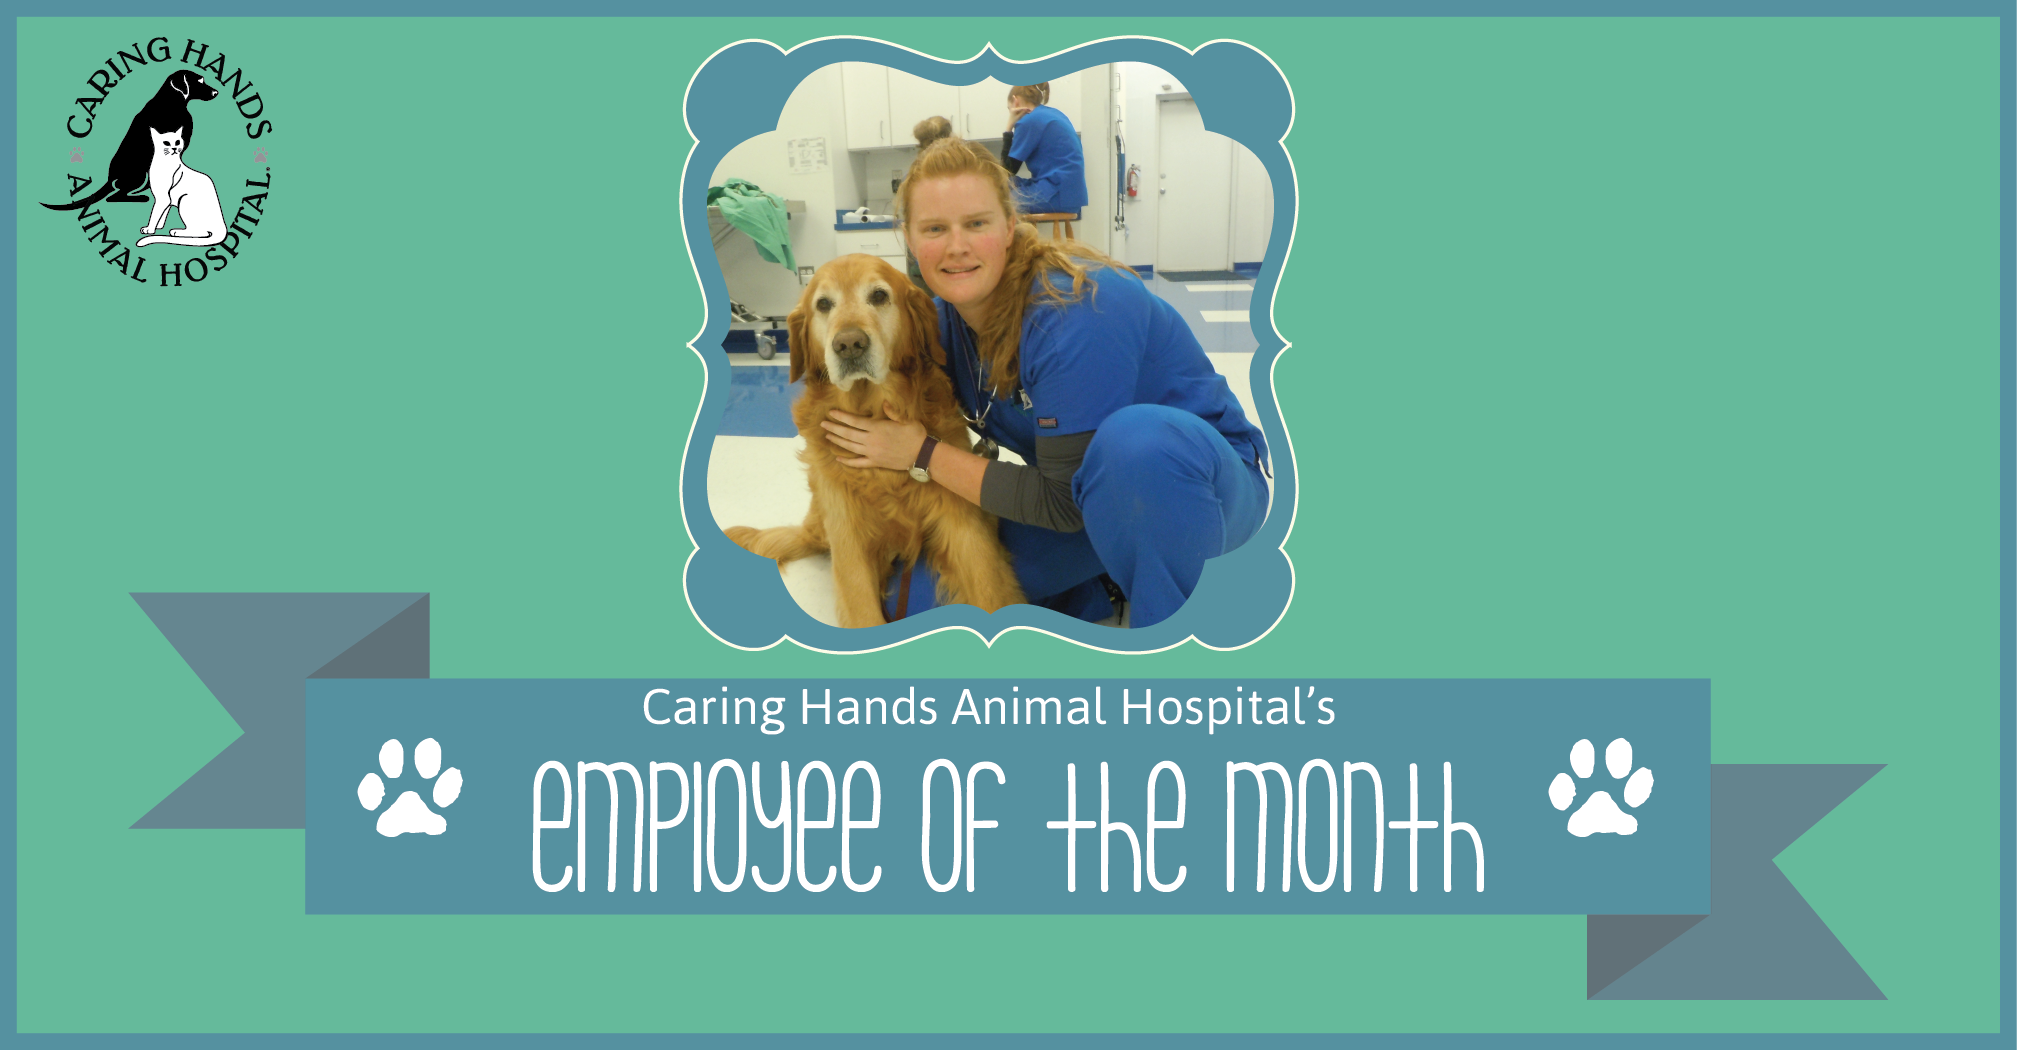 Employee of the Month - Megan Jensen